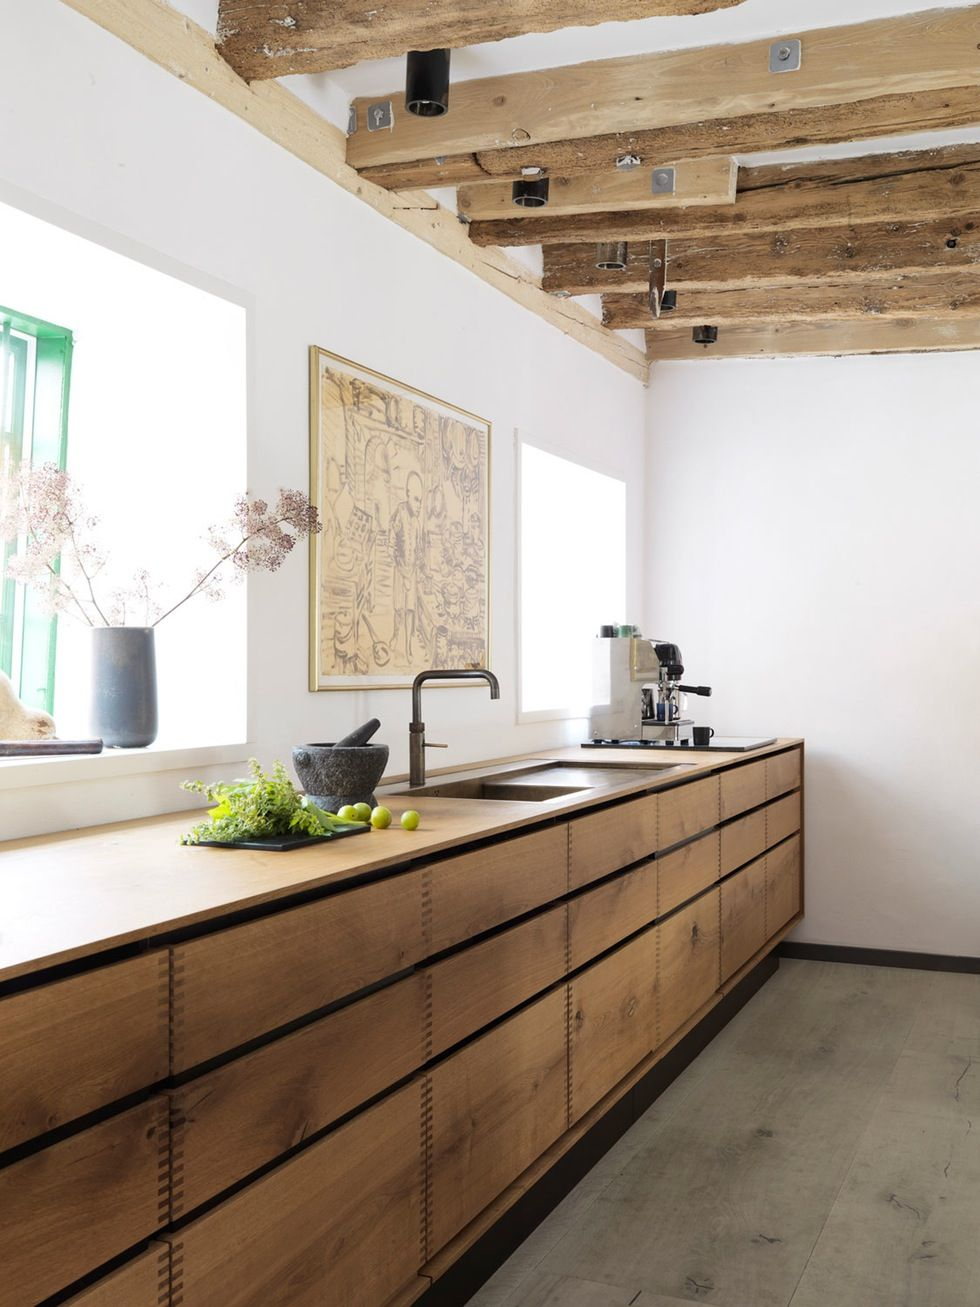 Des cuisines contemporaines rustiques | Sichtbar, Holzküche und ...